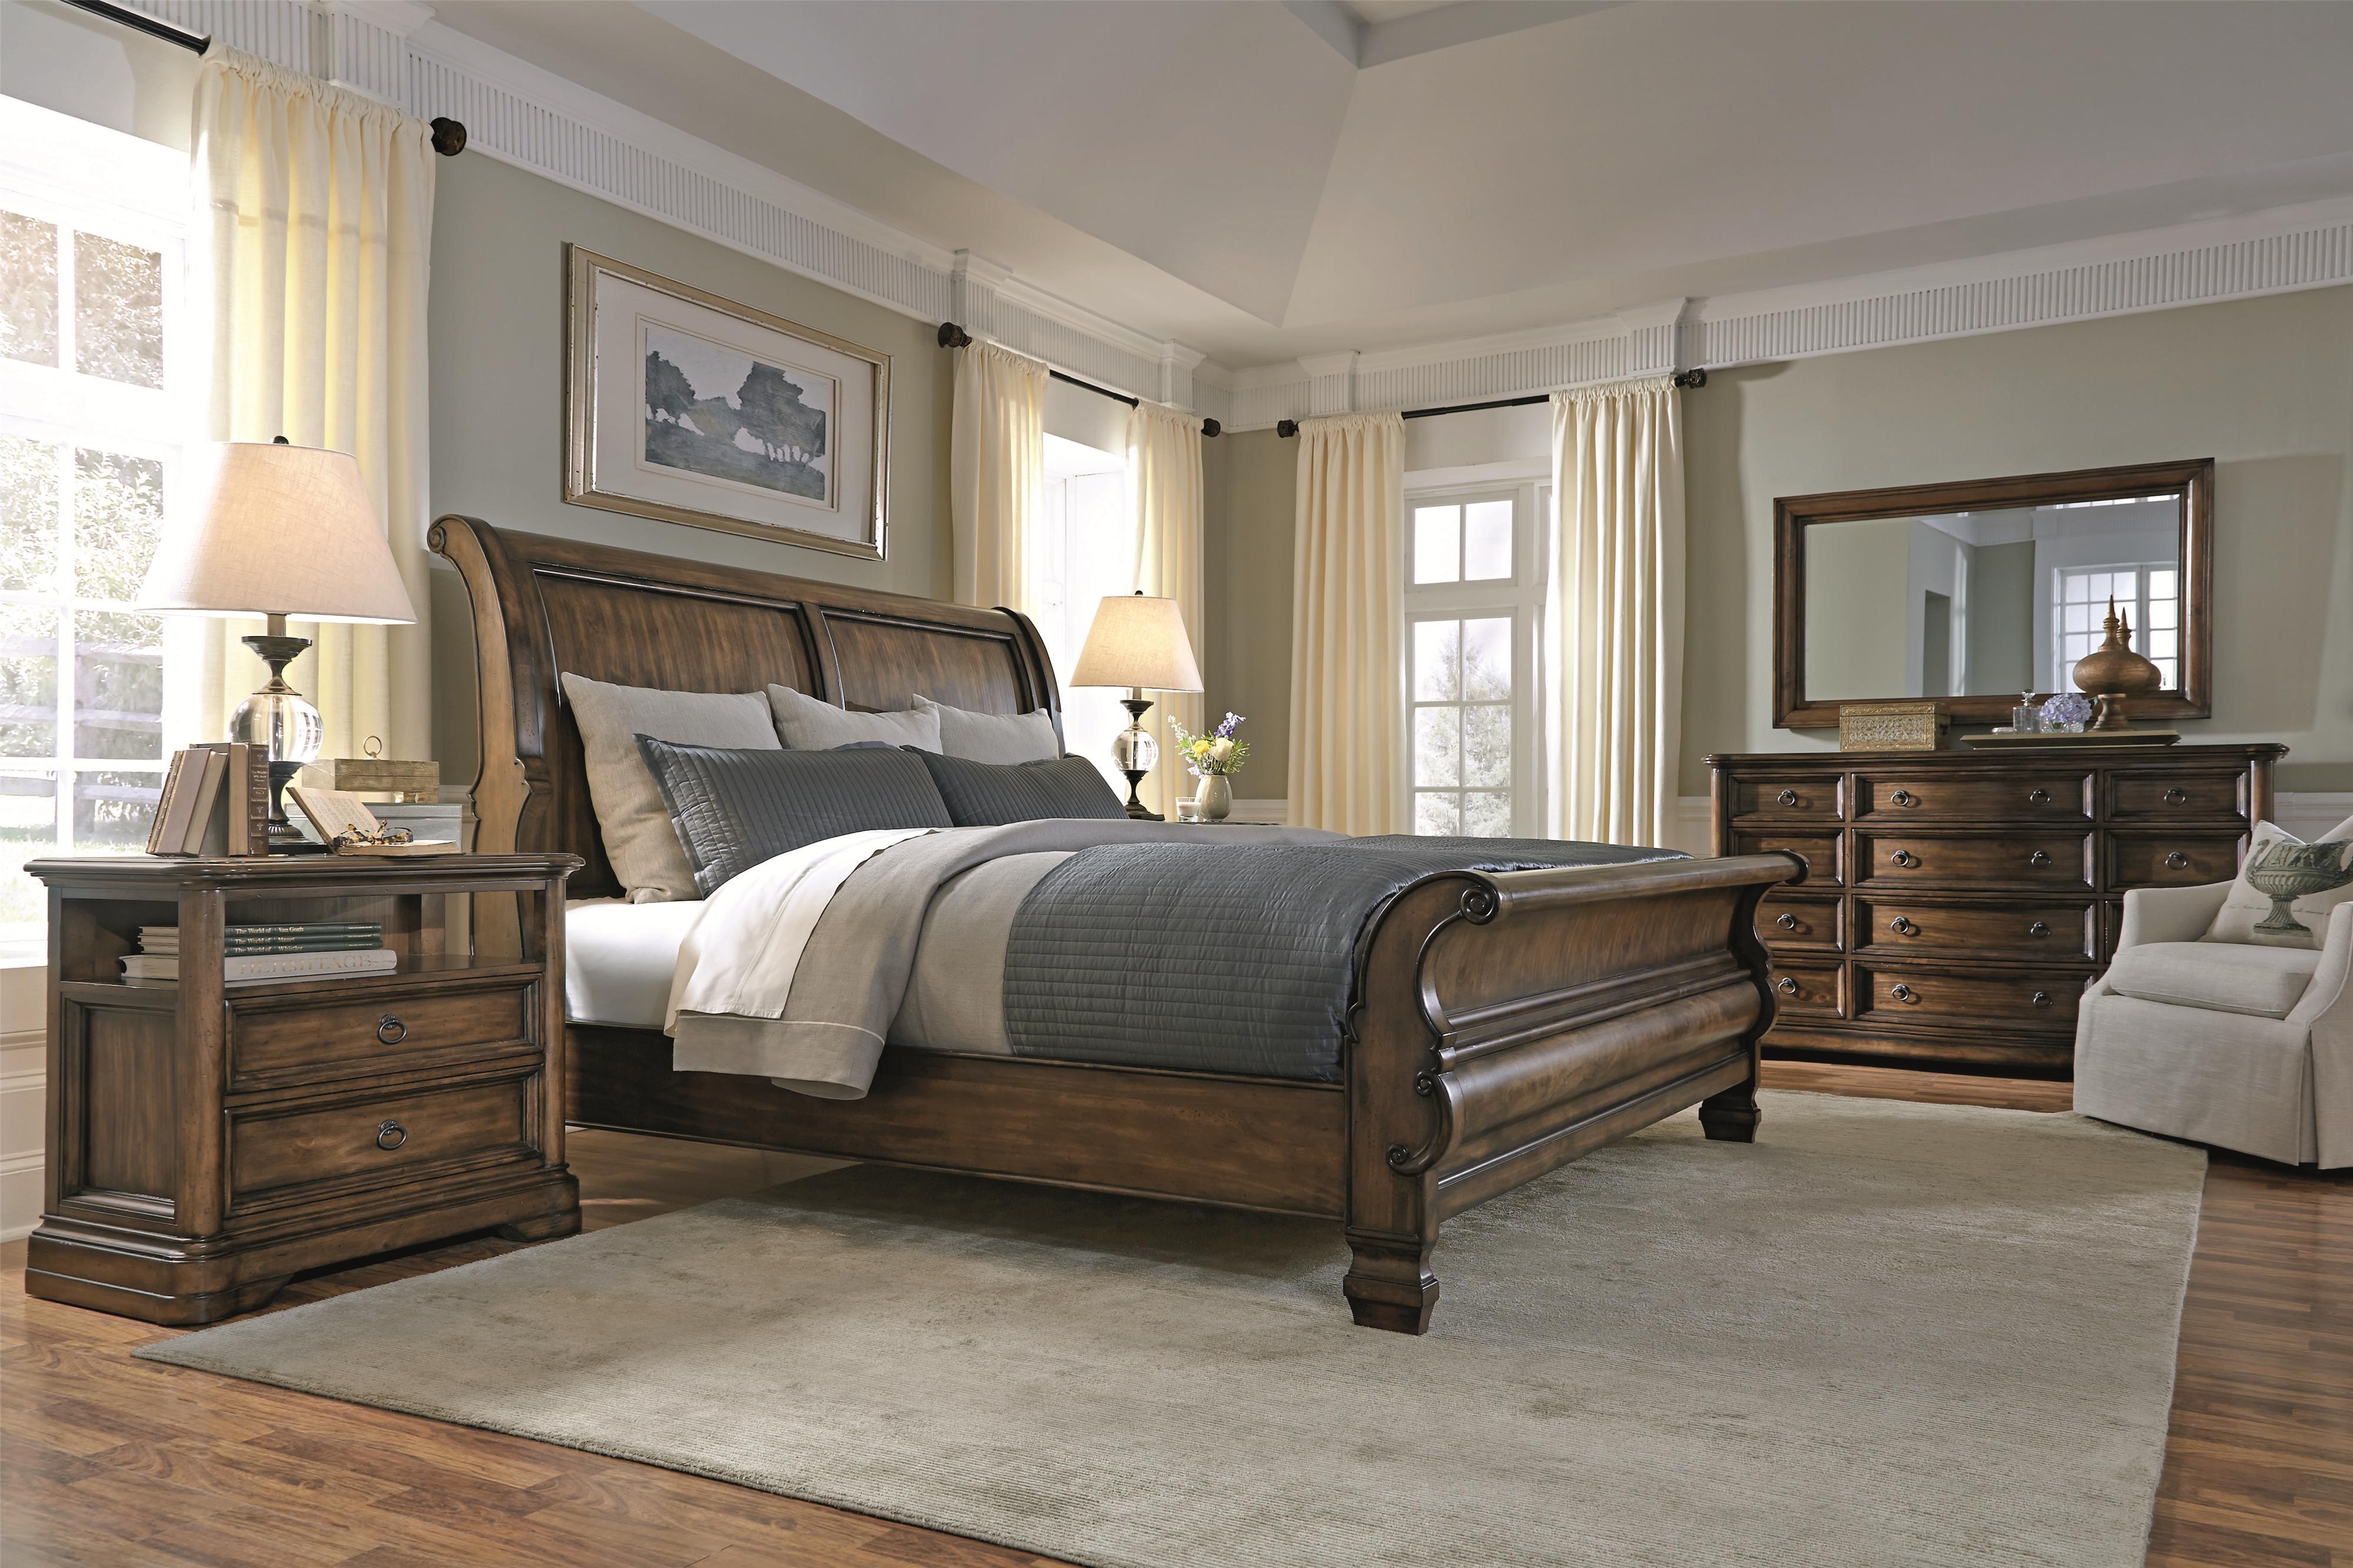 Bernhardt Montebella King Bedroom Group - Item Number: 350 K Bedroom Group 3